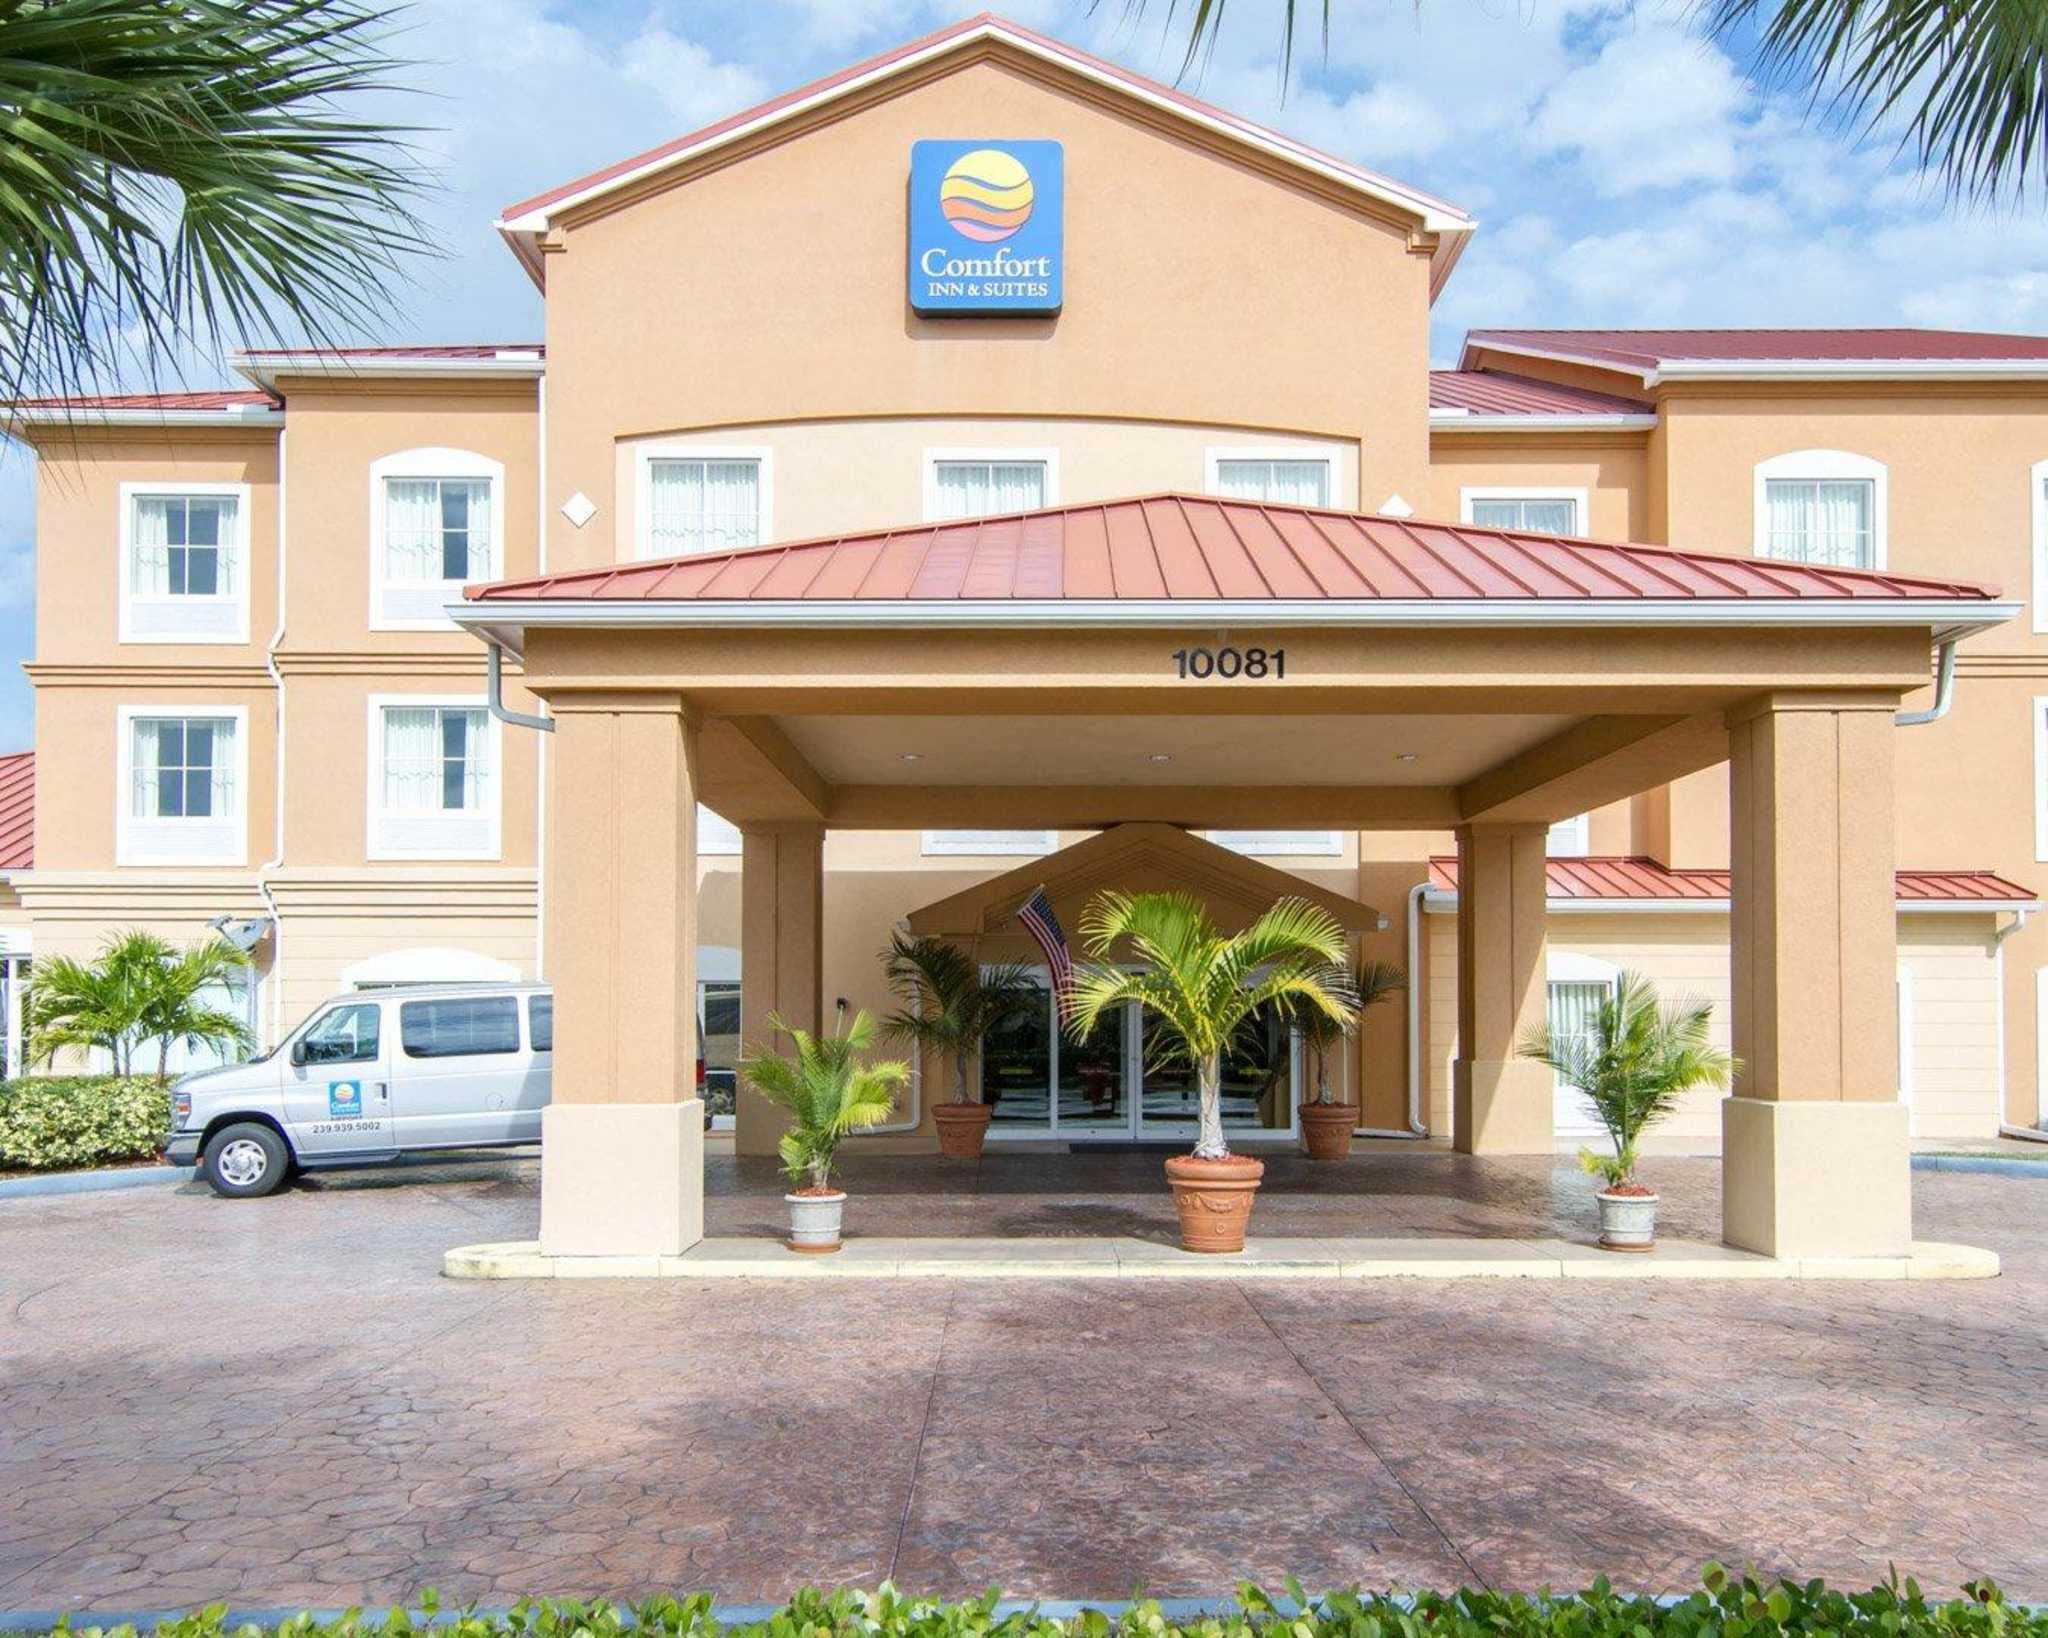 Comfort Inn & Suites Airport image 1